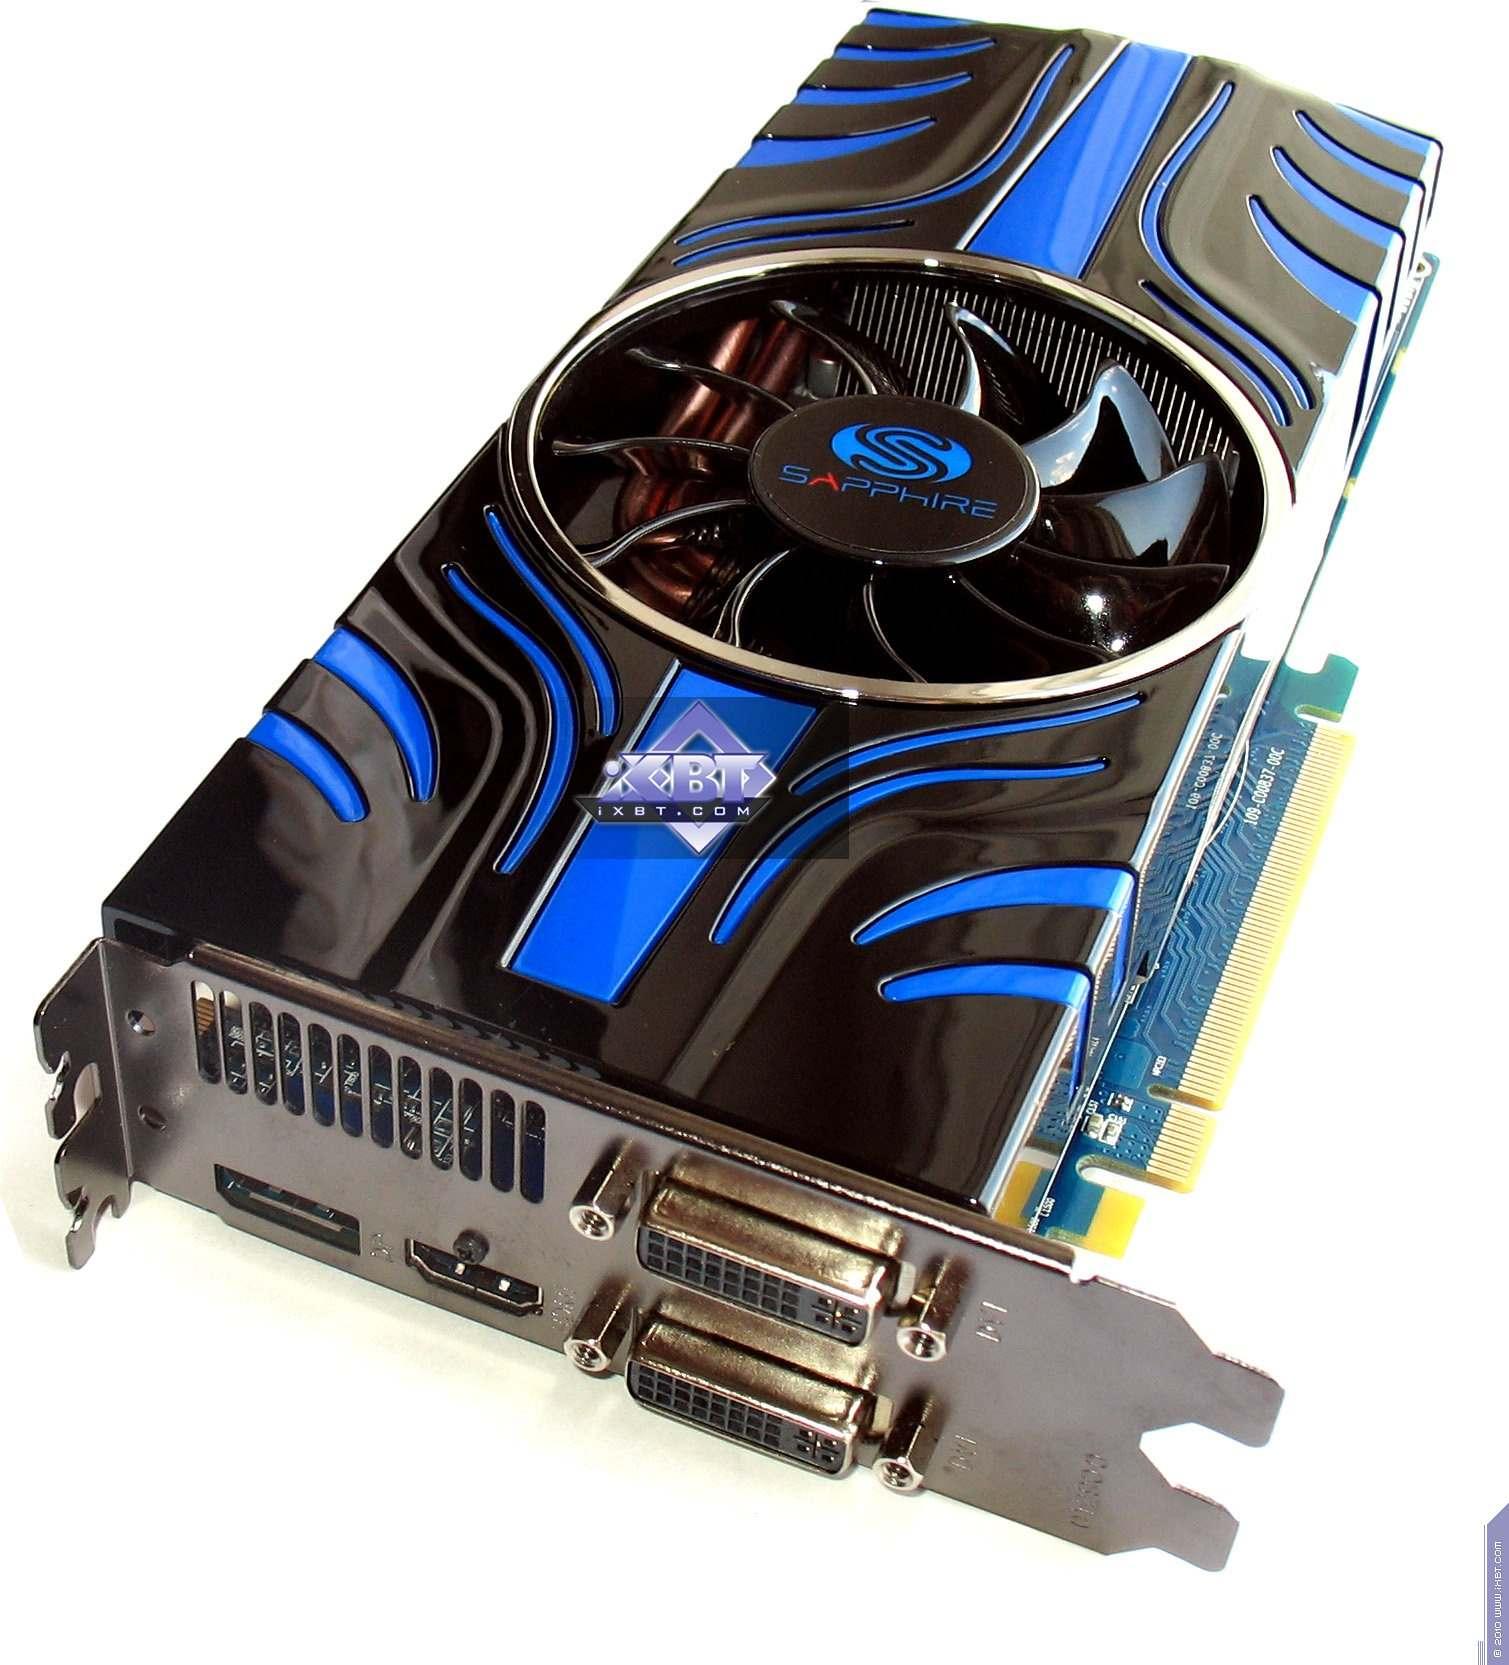 AMD RADEON HD 5850 GRAPHICS DRIVER FOR WINDOWS DOWNLOAD